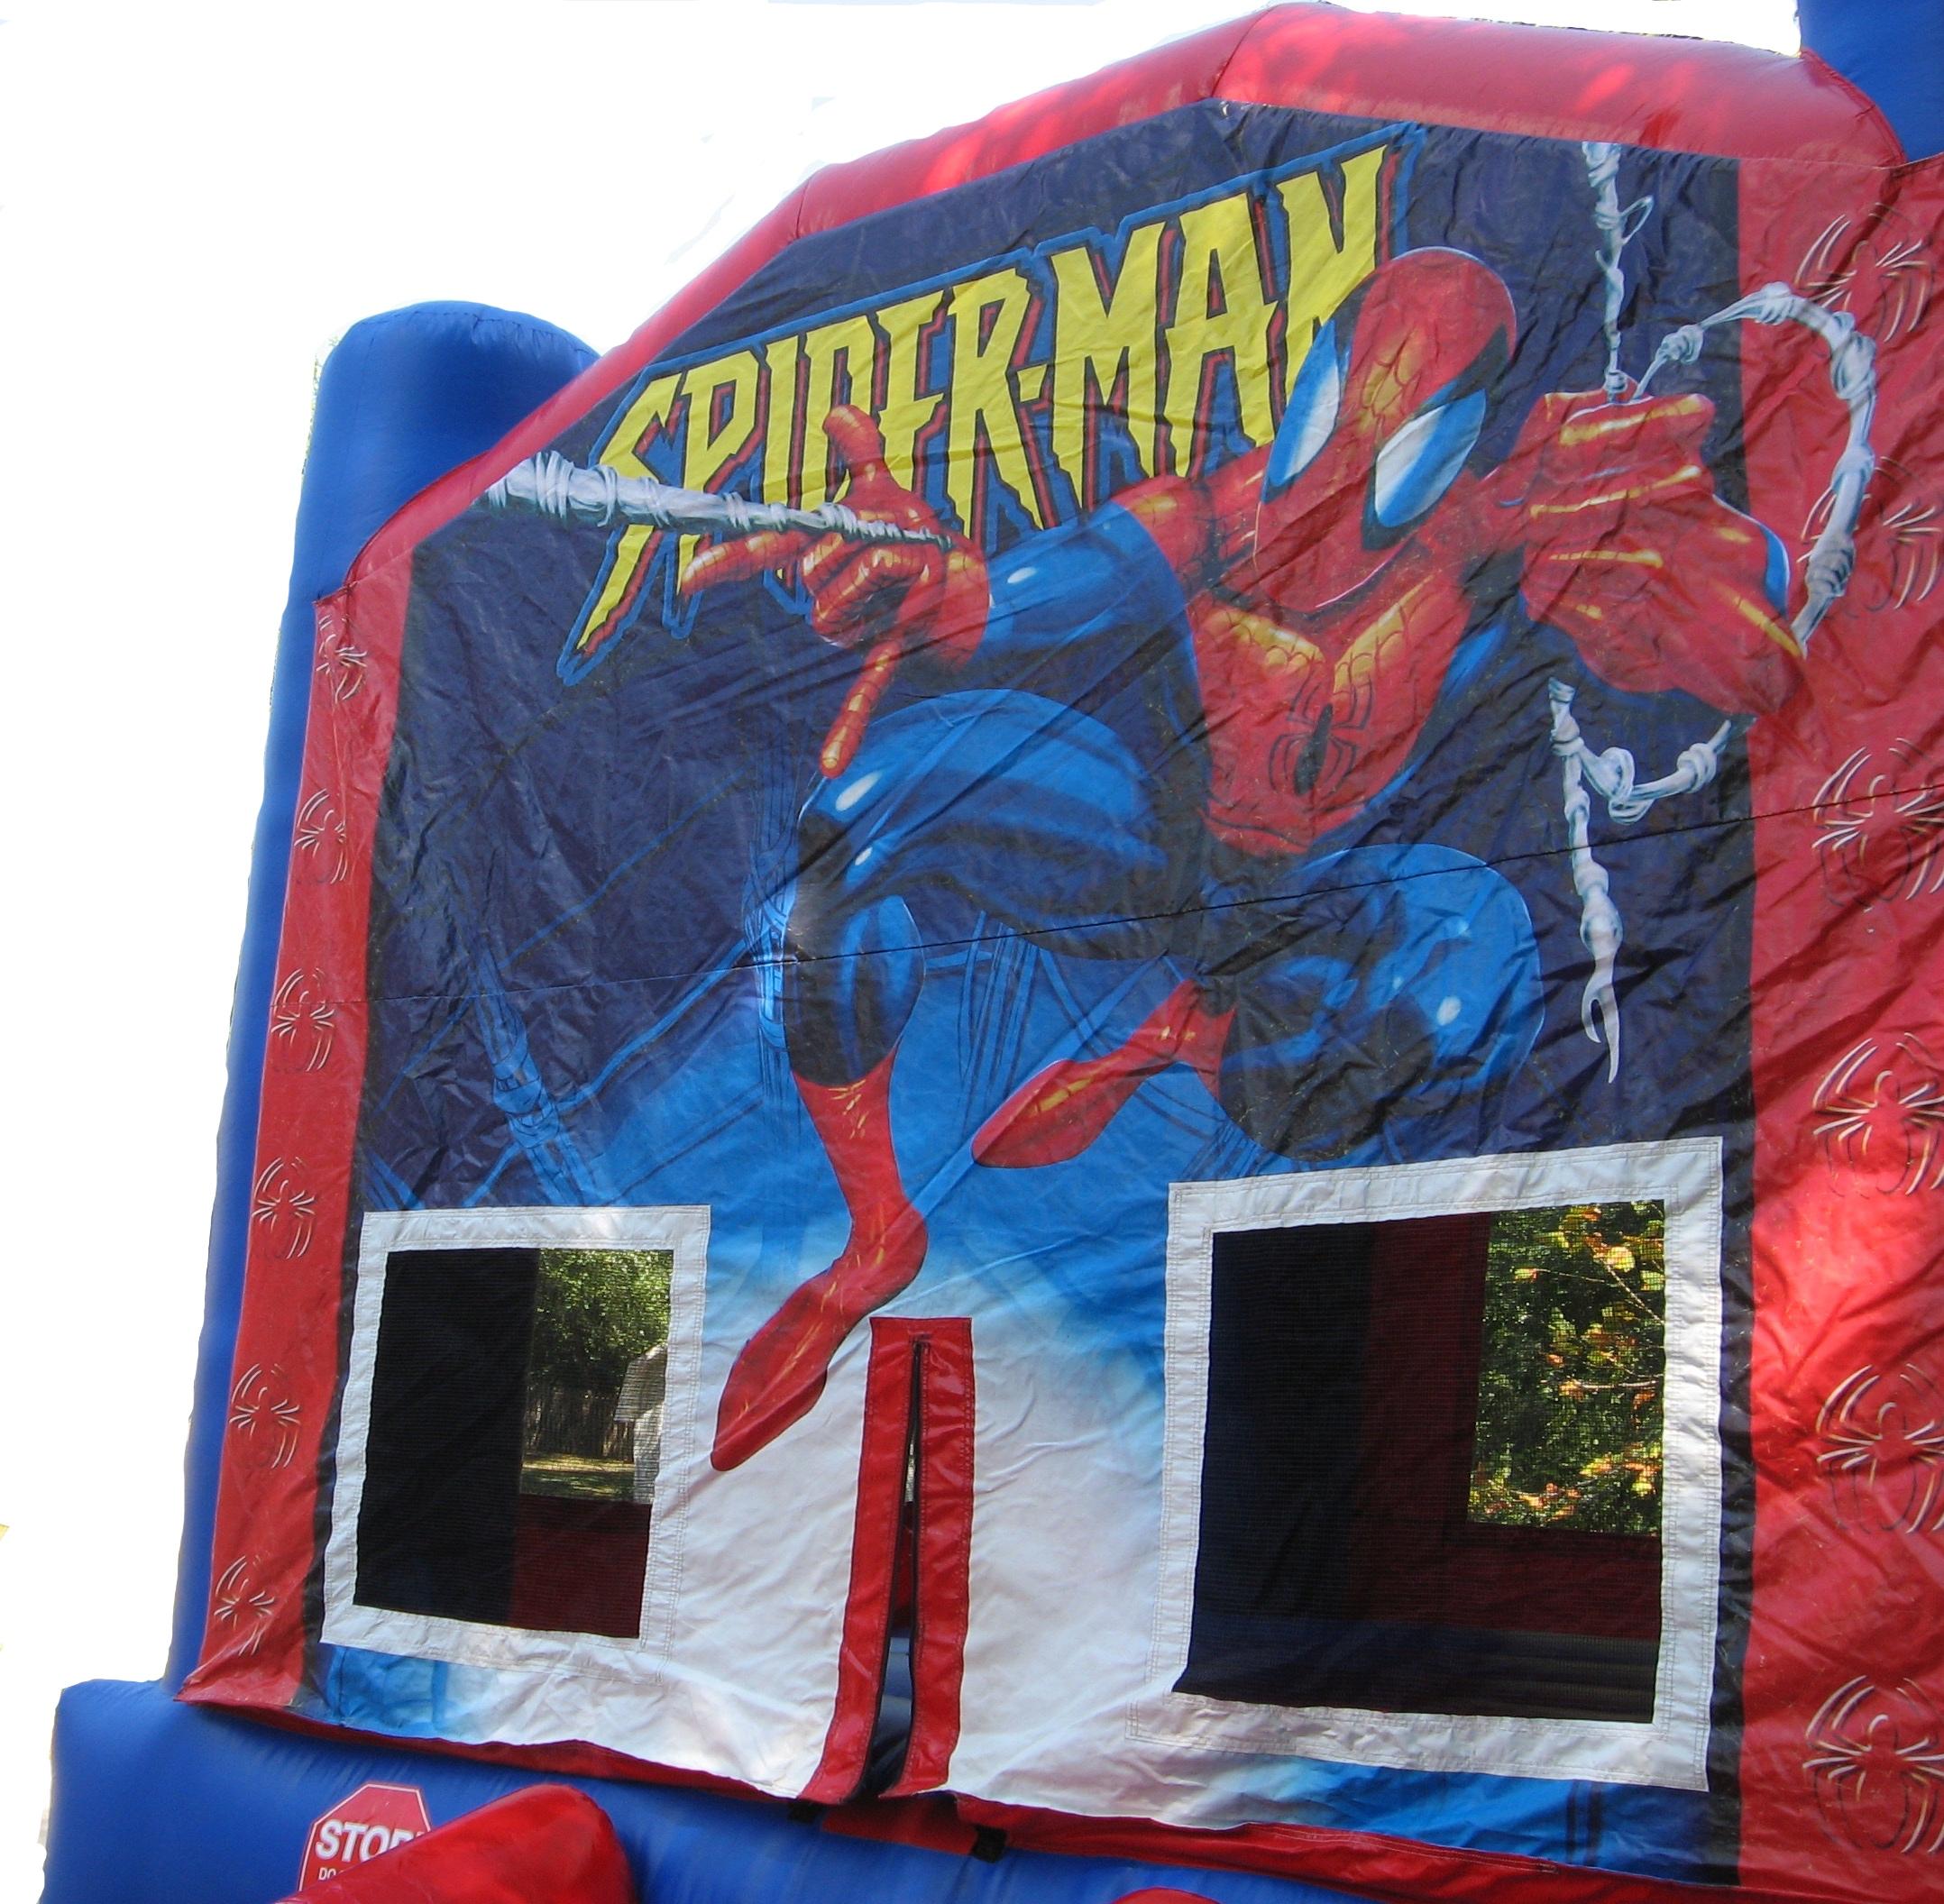 Spiderman Bouncer.jpg